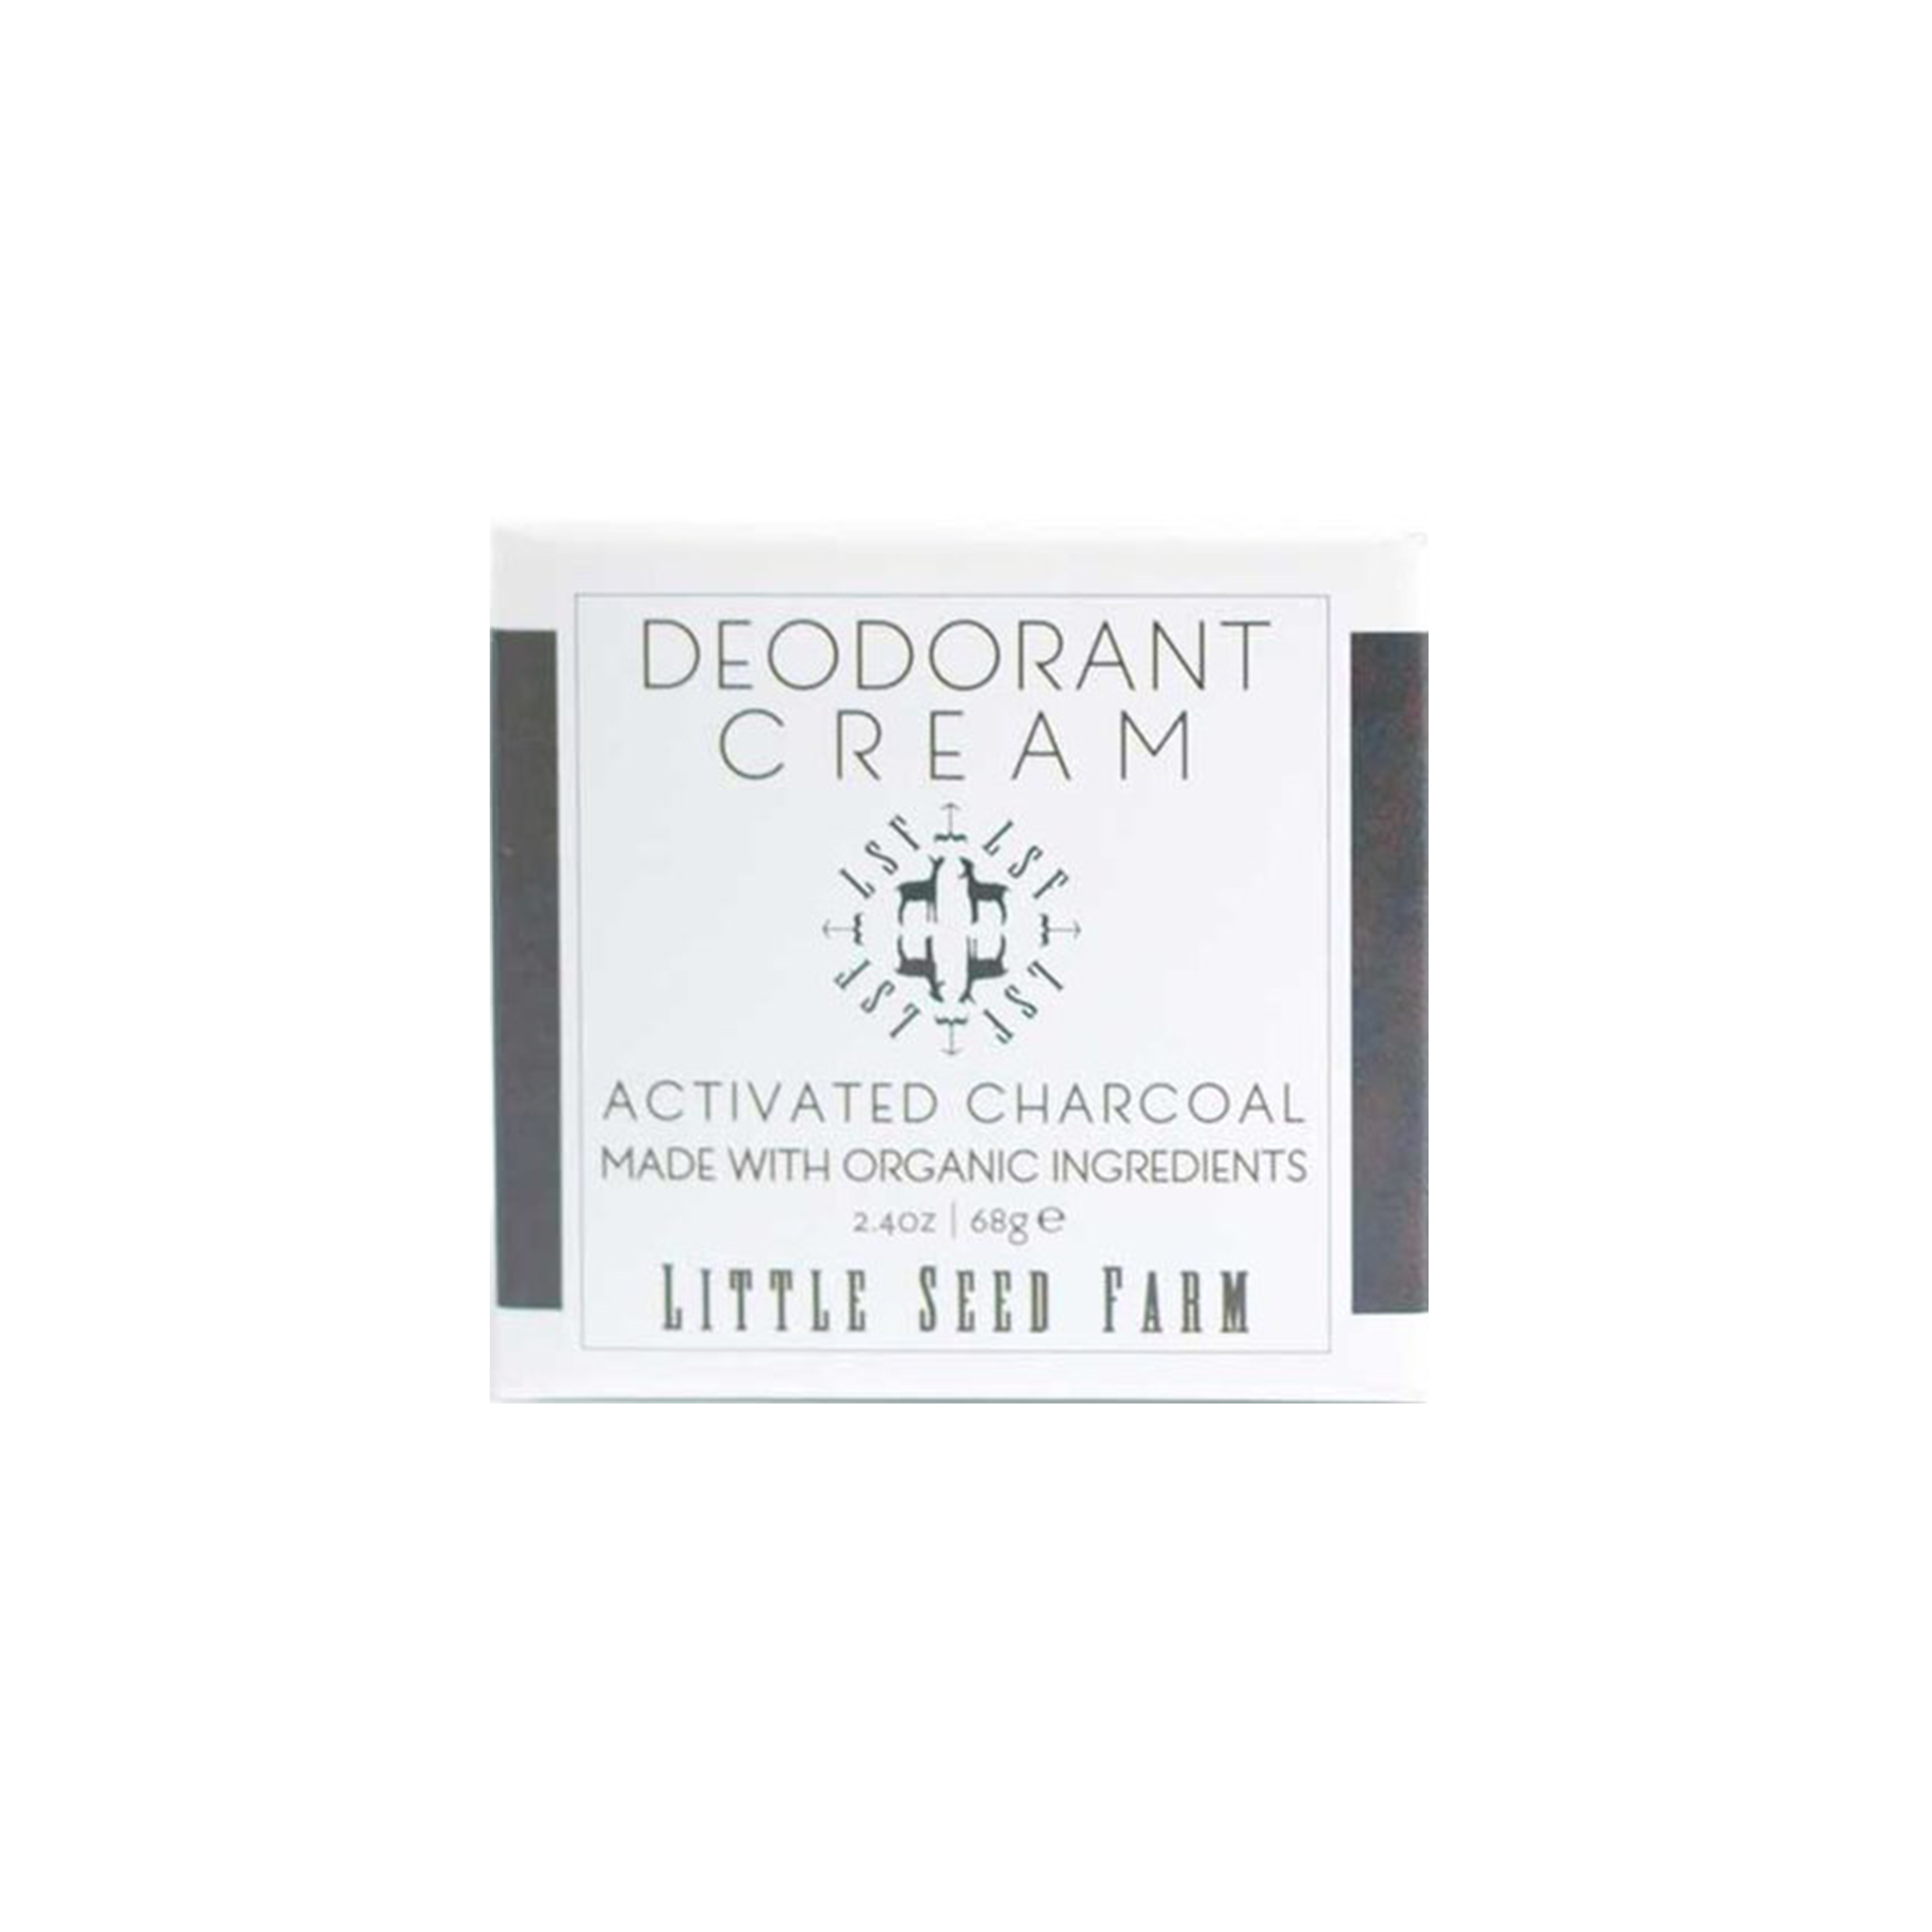 Little Seed Farm Deodorant Cream